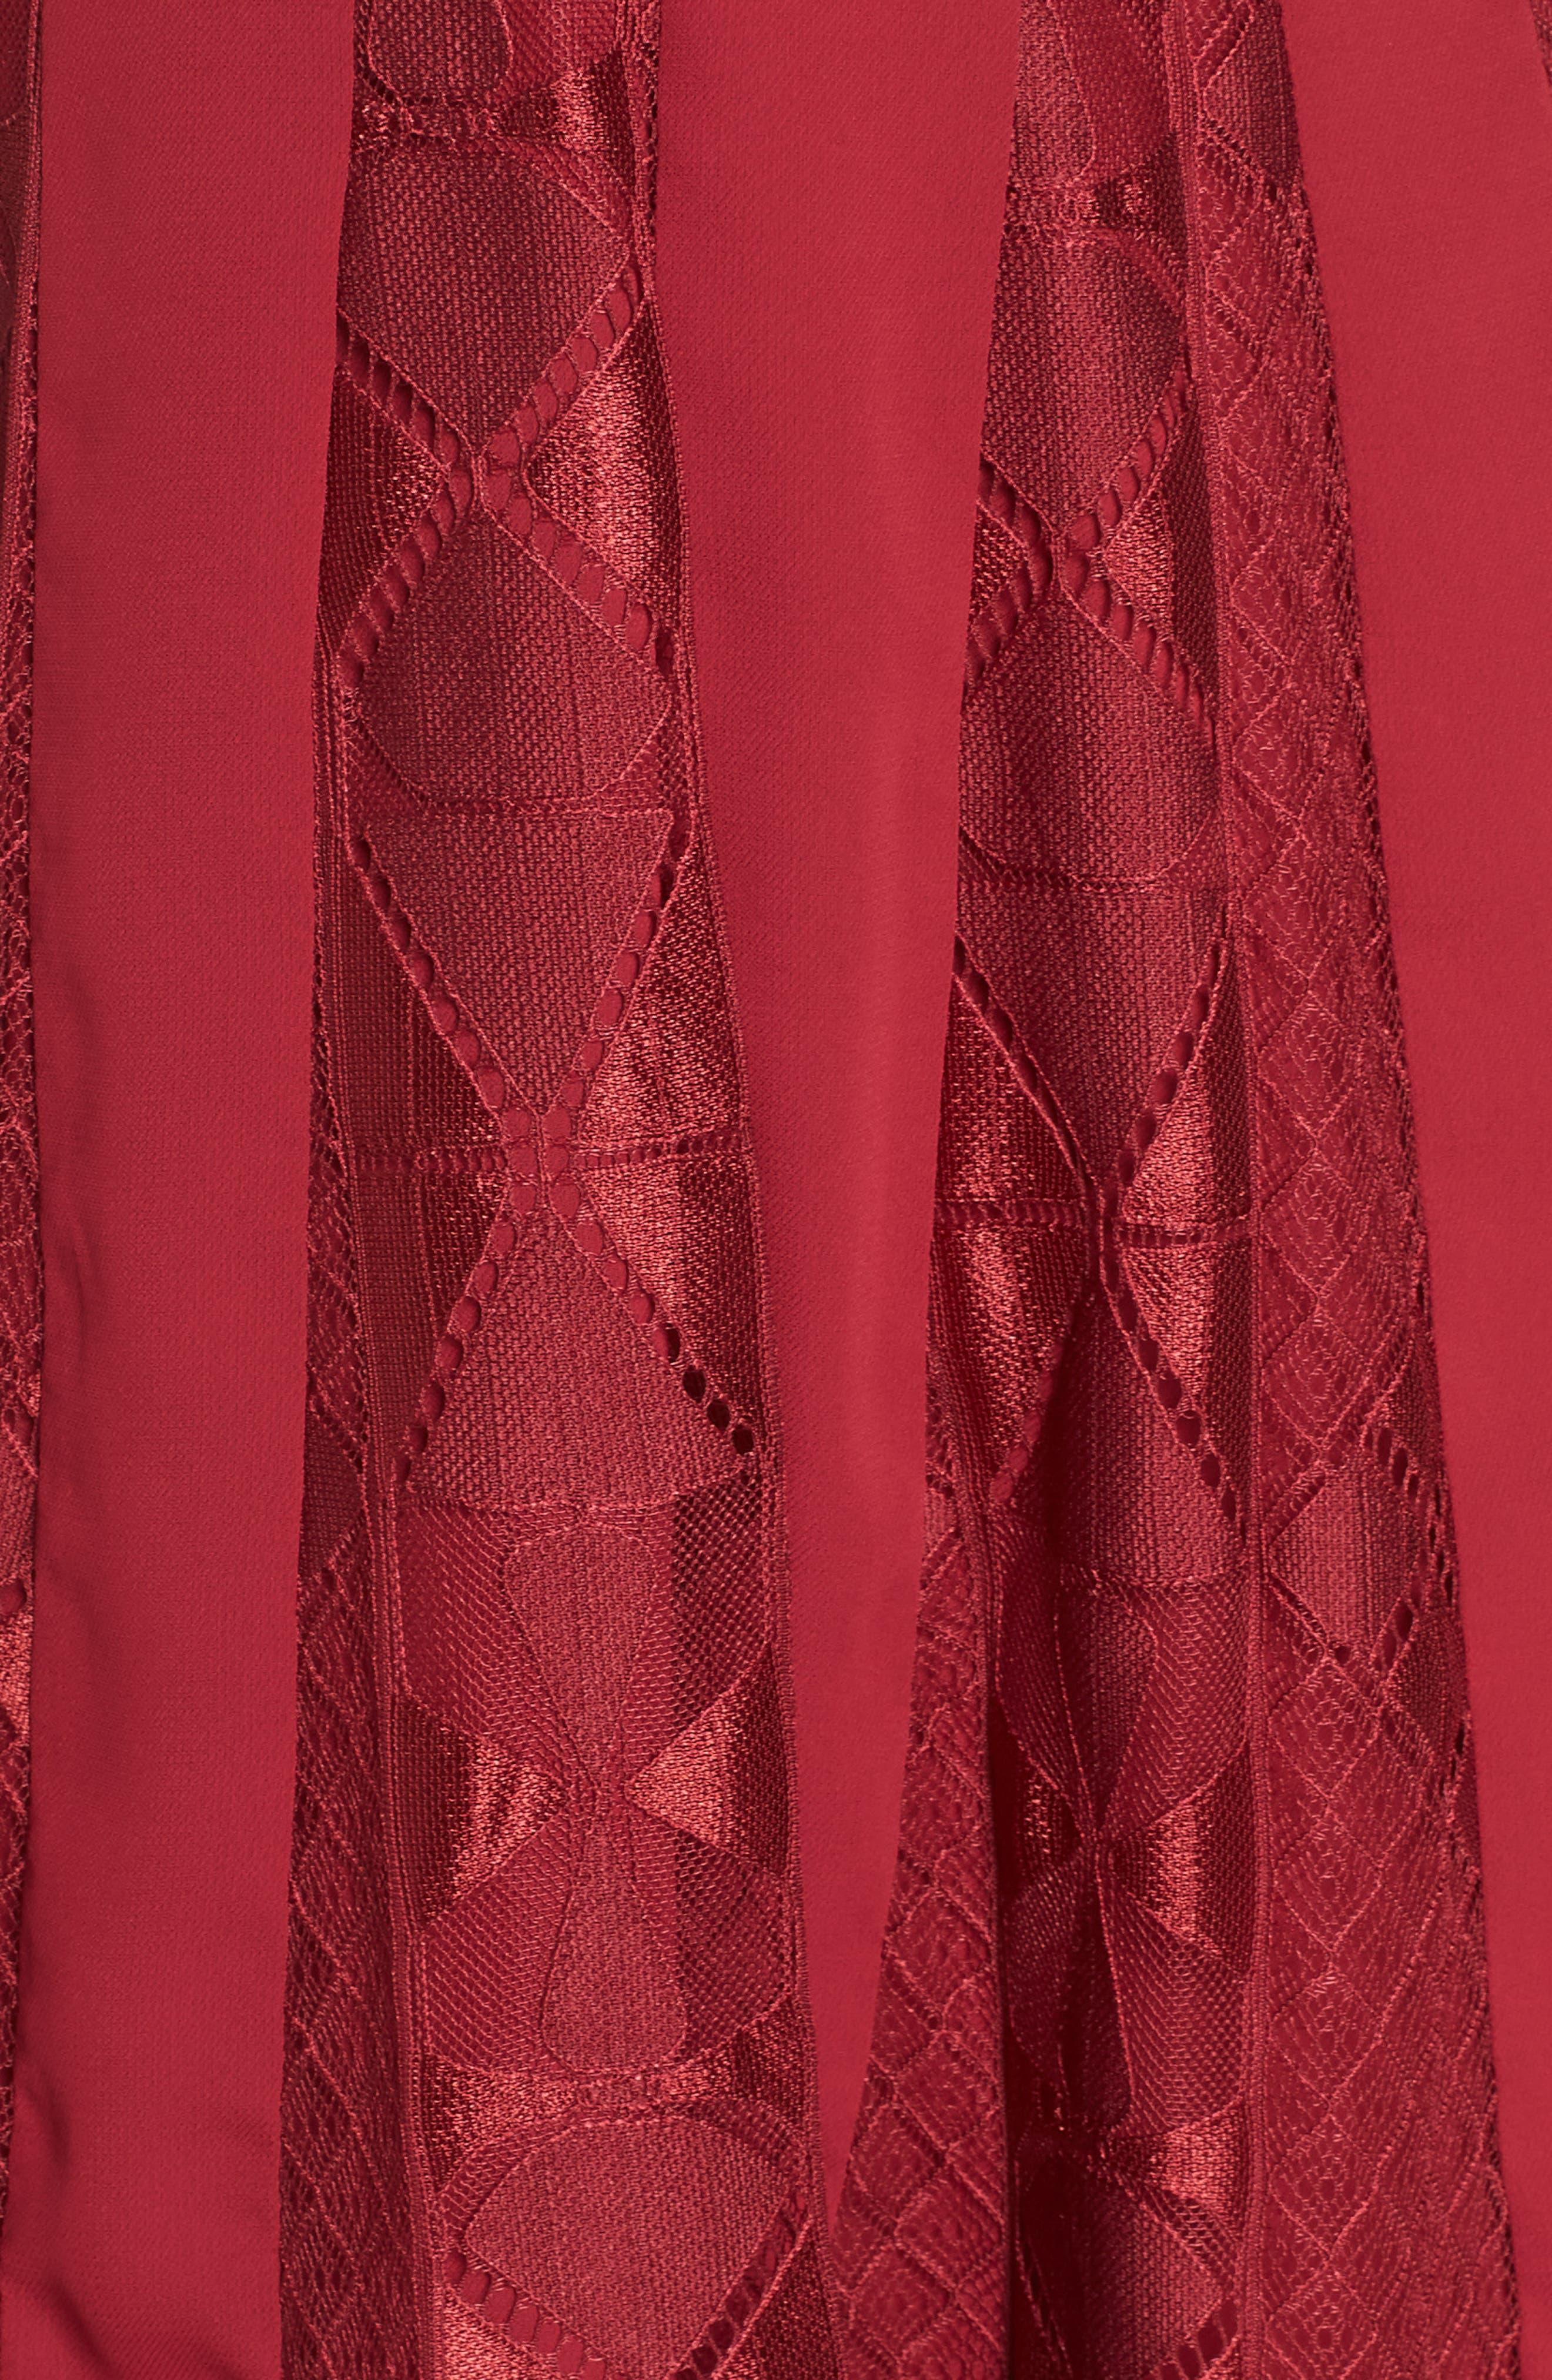 Calla Lace Dress,                             Alternate thumbnail 6, color,                             930